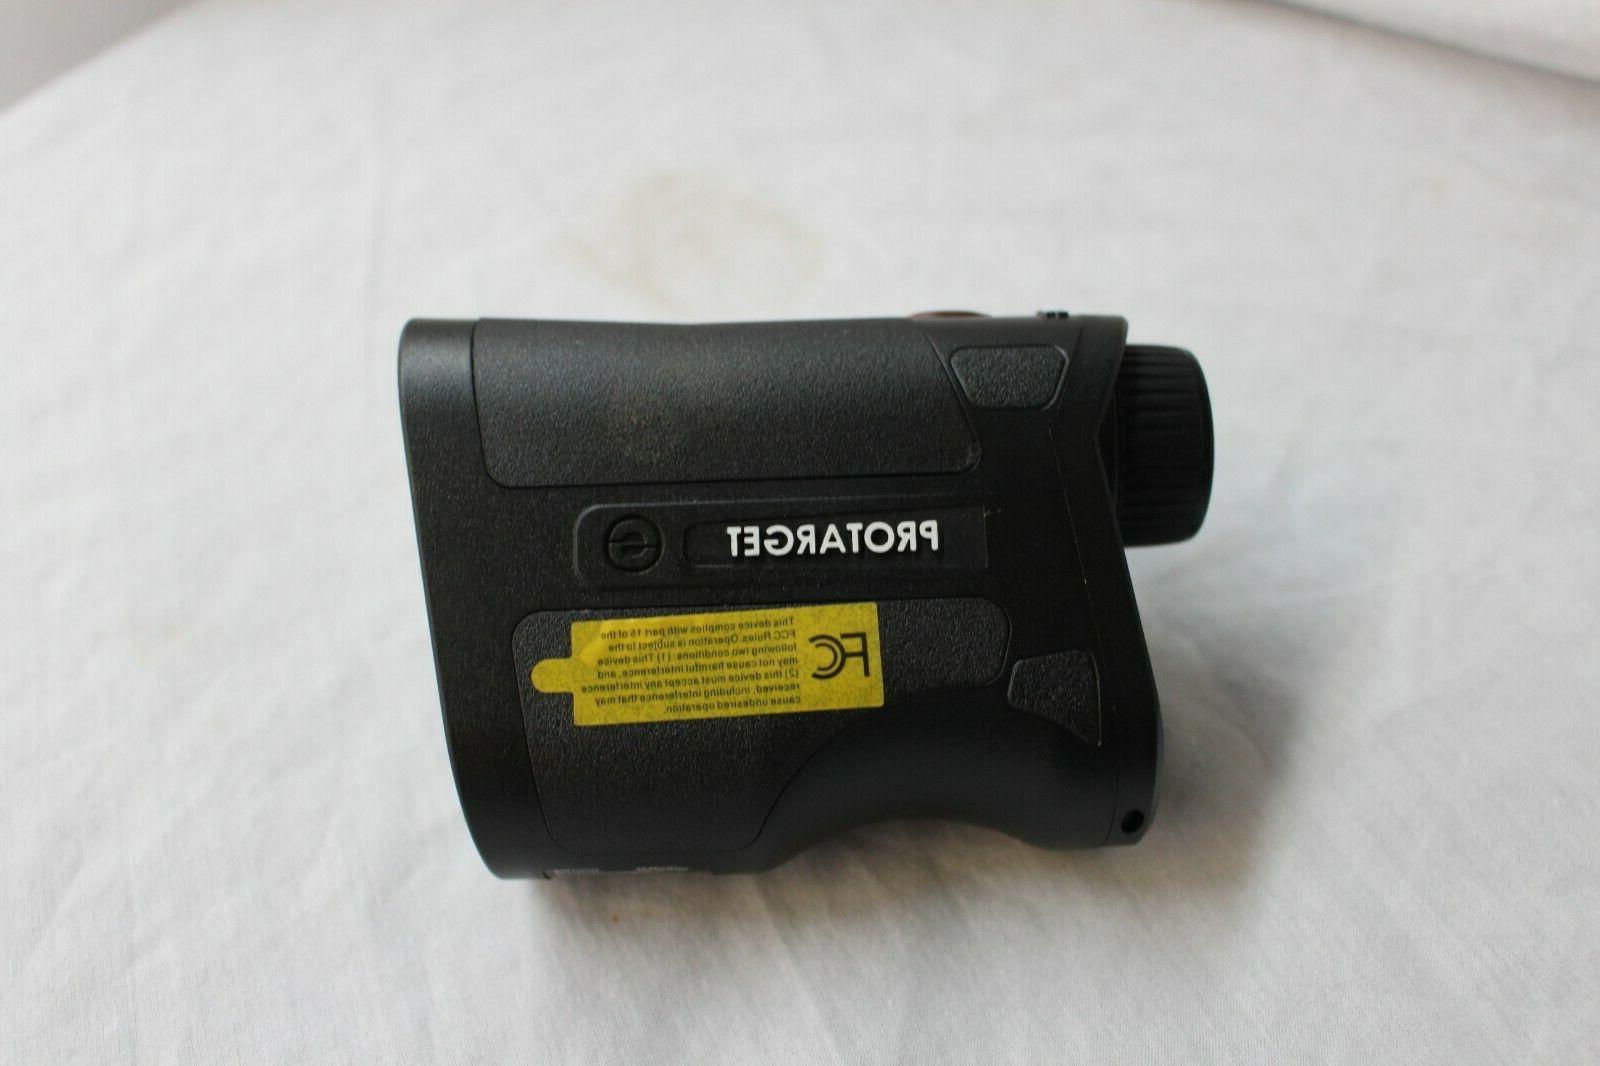 SIMMONS PROTARGET RANGEFINDER 6x20mm - IN BOX